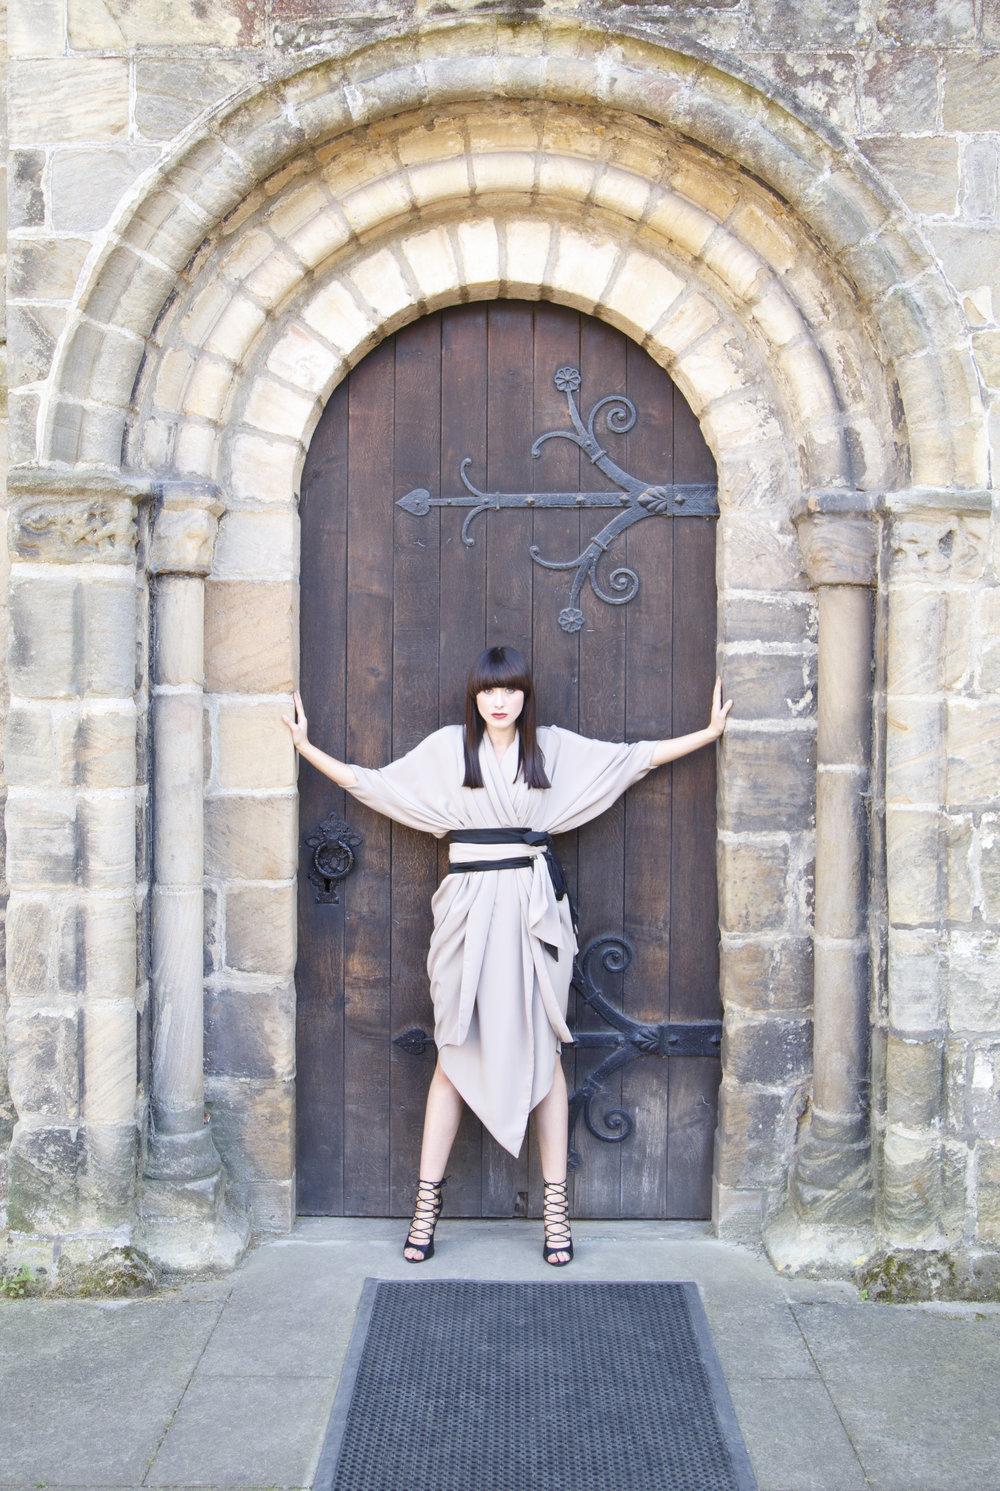 zaramia-ava-zaramiaava-leeds-fashion-designer-ethical-sustainable-nude-versatile-drape-ayame-jacket-emi-dress-obi-belt-black-ami-scarf-japanese-womenswear-arch-door-3